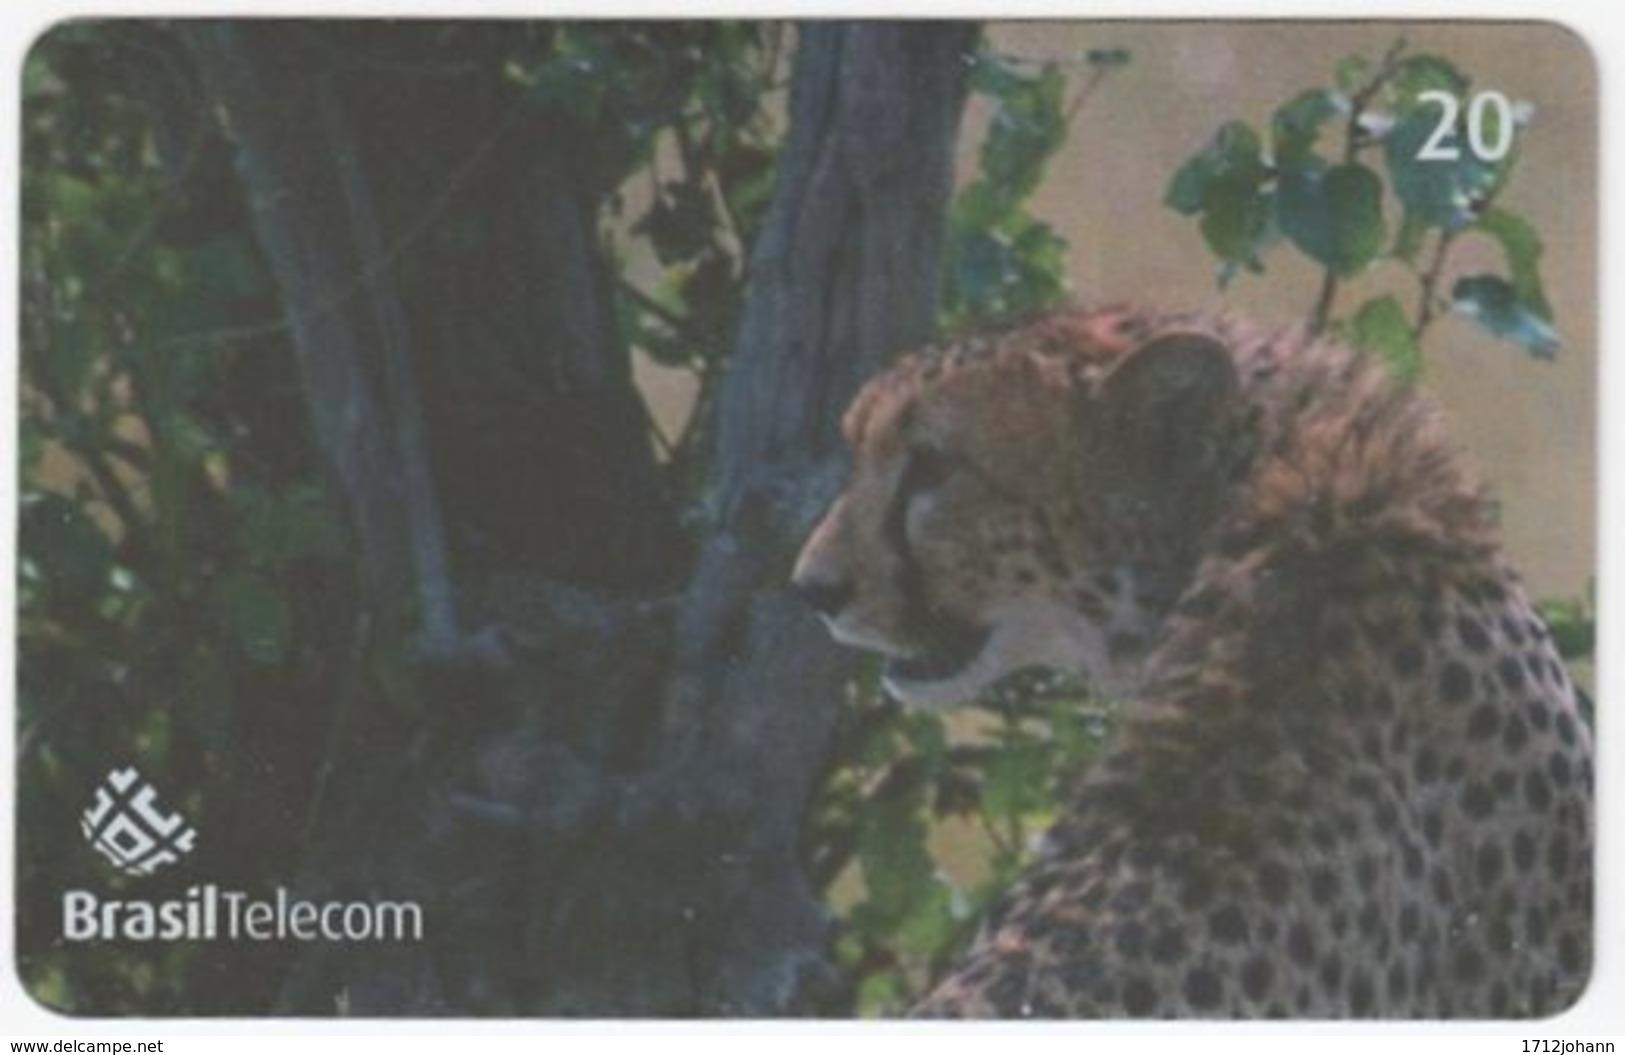 BRASIL G-779 Magnetic BrasilTelecom - Animal, Cat, Cheetah (Puzzle 1 Of 2) - Used - Brasilien